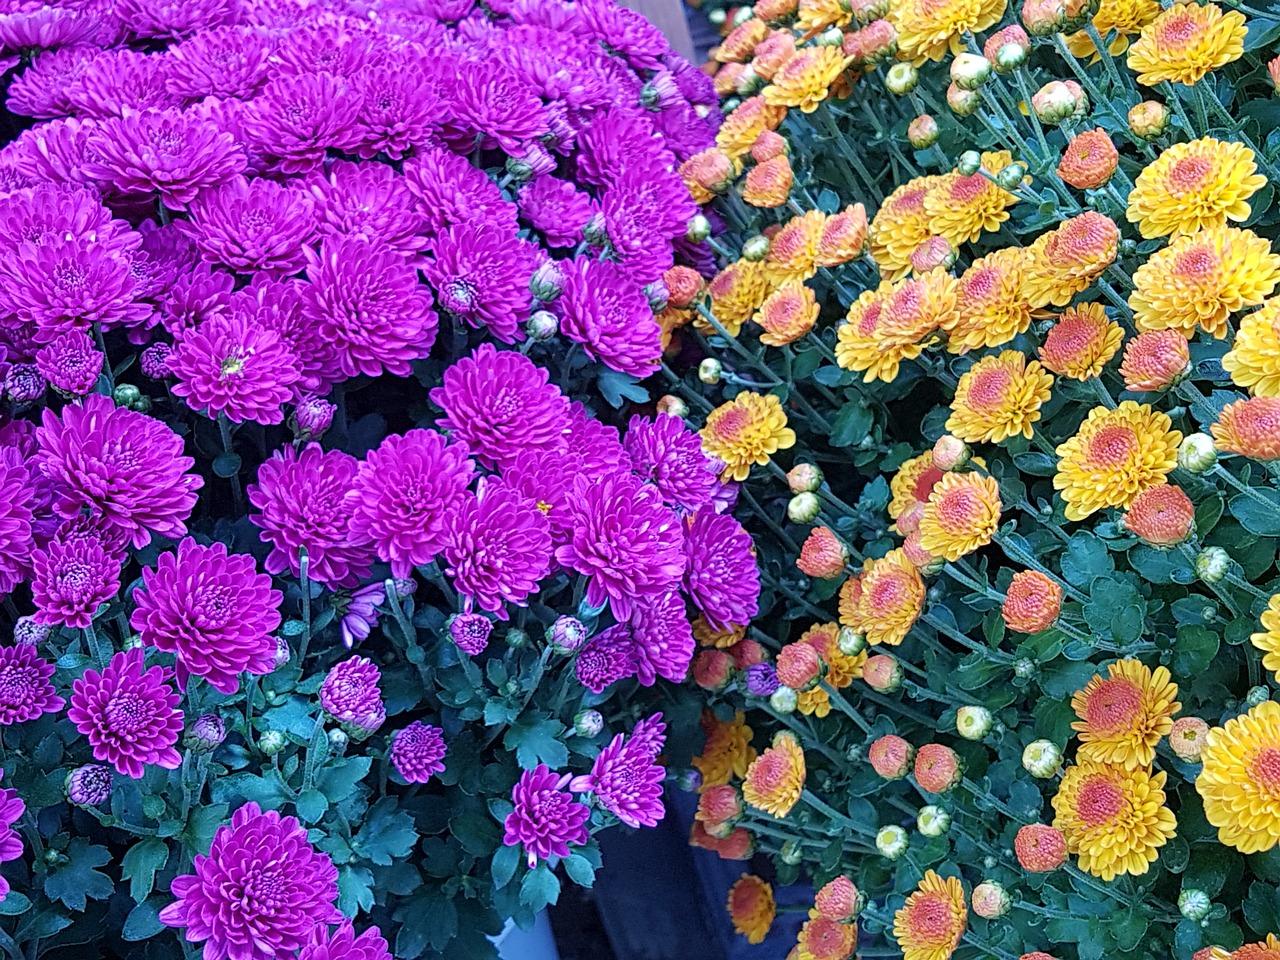 Autumnbecomingkogikupinkfall flowers free photo from needpix autumnbecomingkogikupinkfall flowersnaturefree pictures mightylinksfo